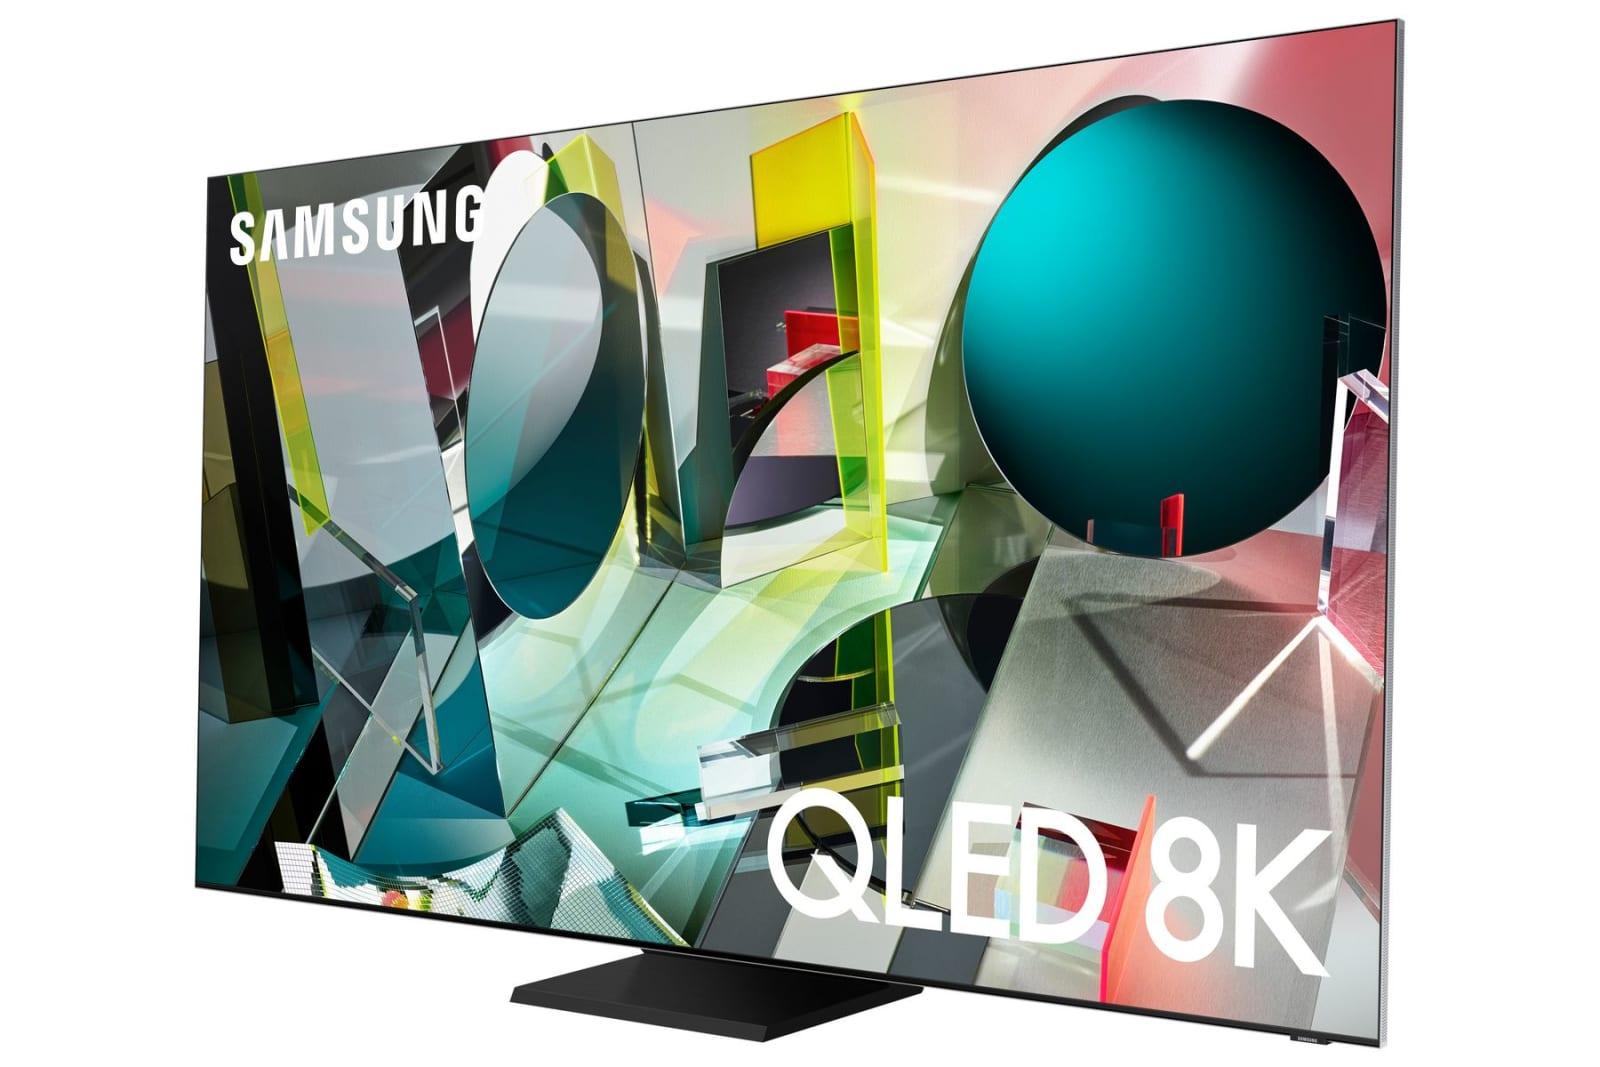 Samsung 4K 8K QLED TVs 2020